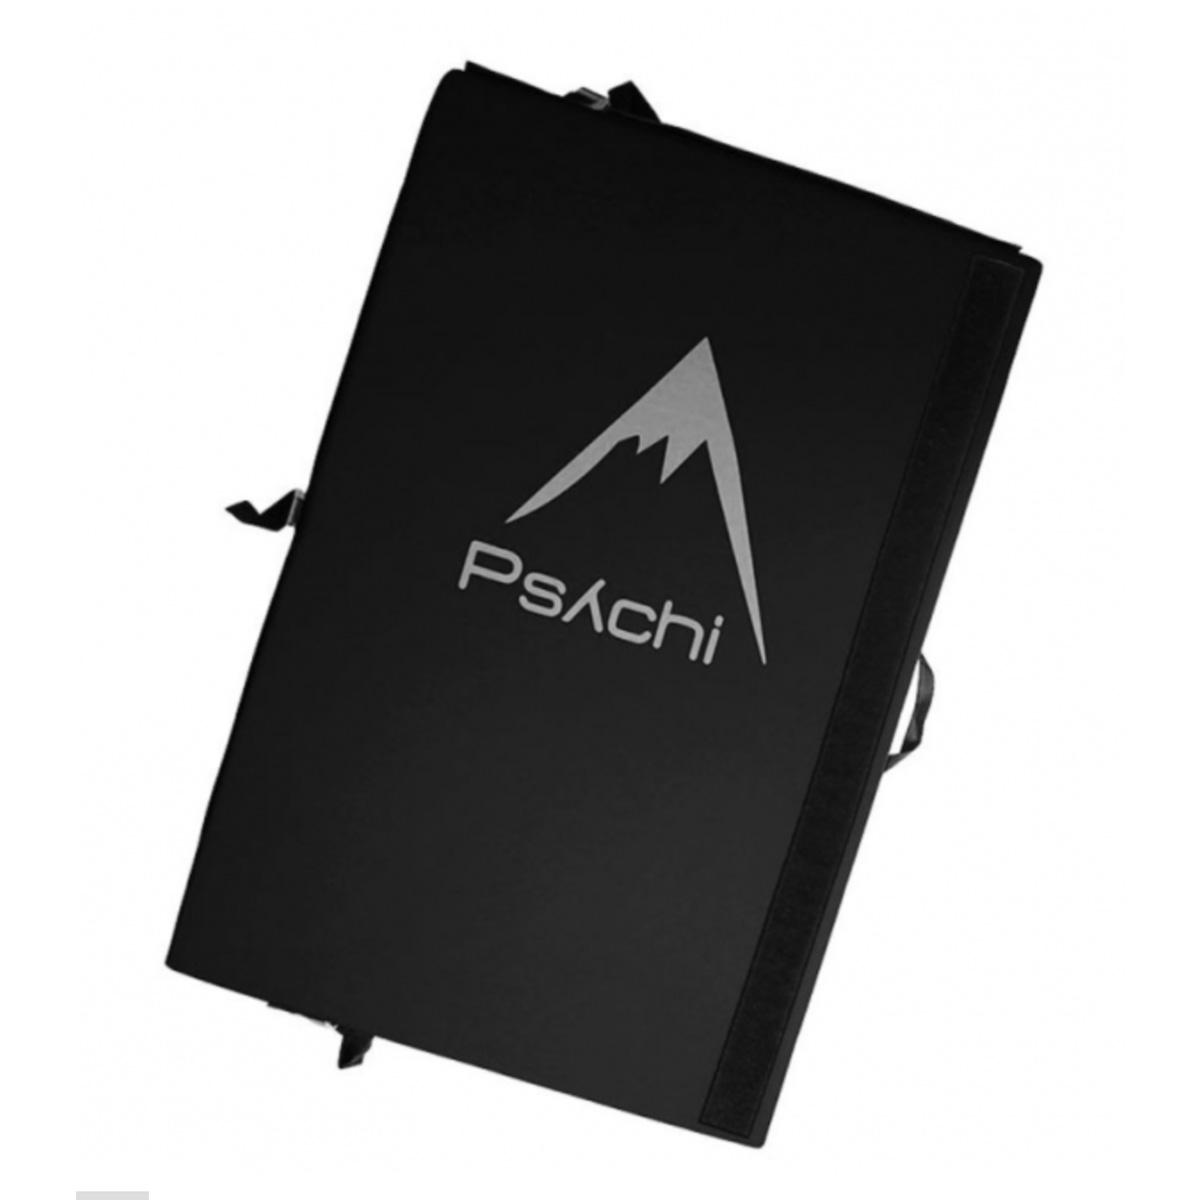 Psychi Dual Fold Crash Pad Bouldering Mats Epictv Shop